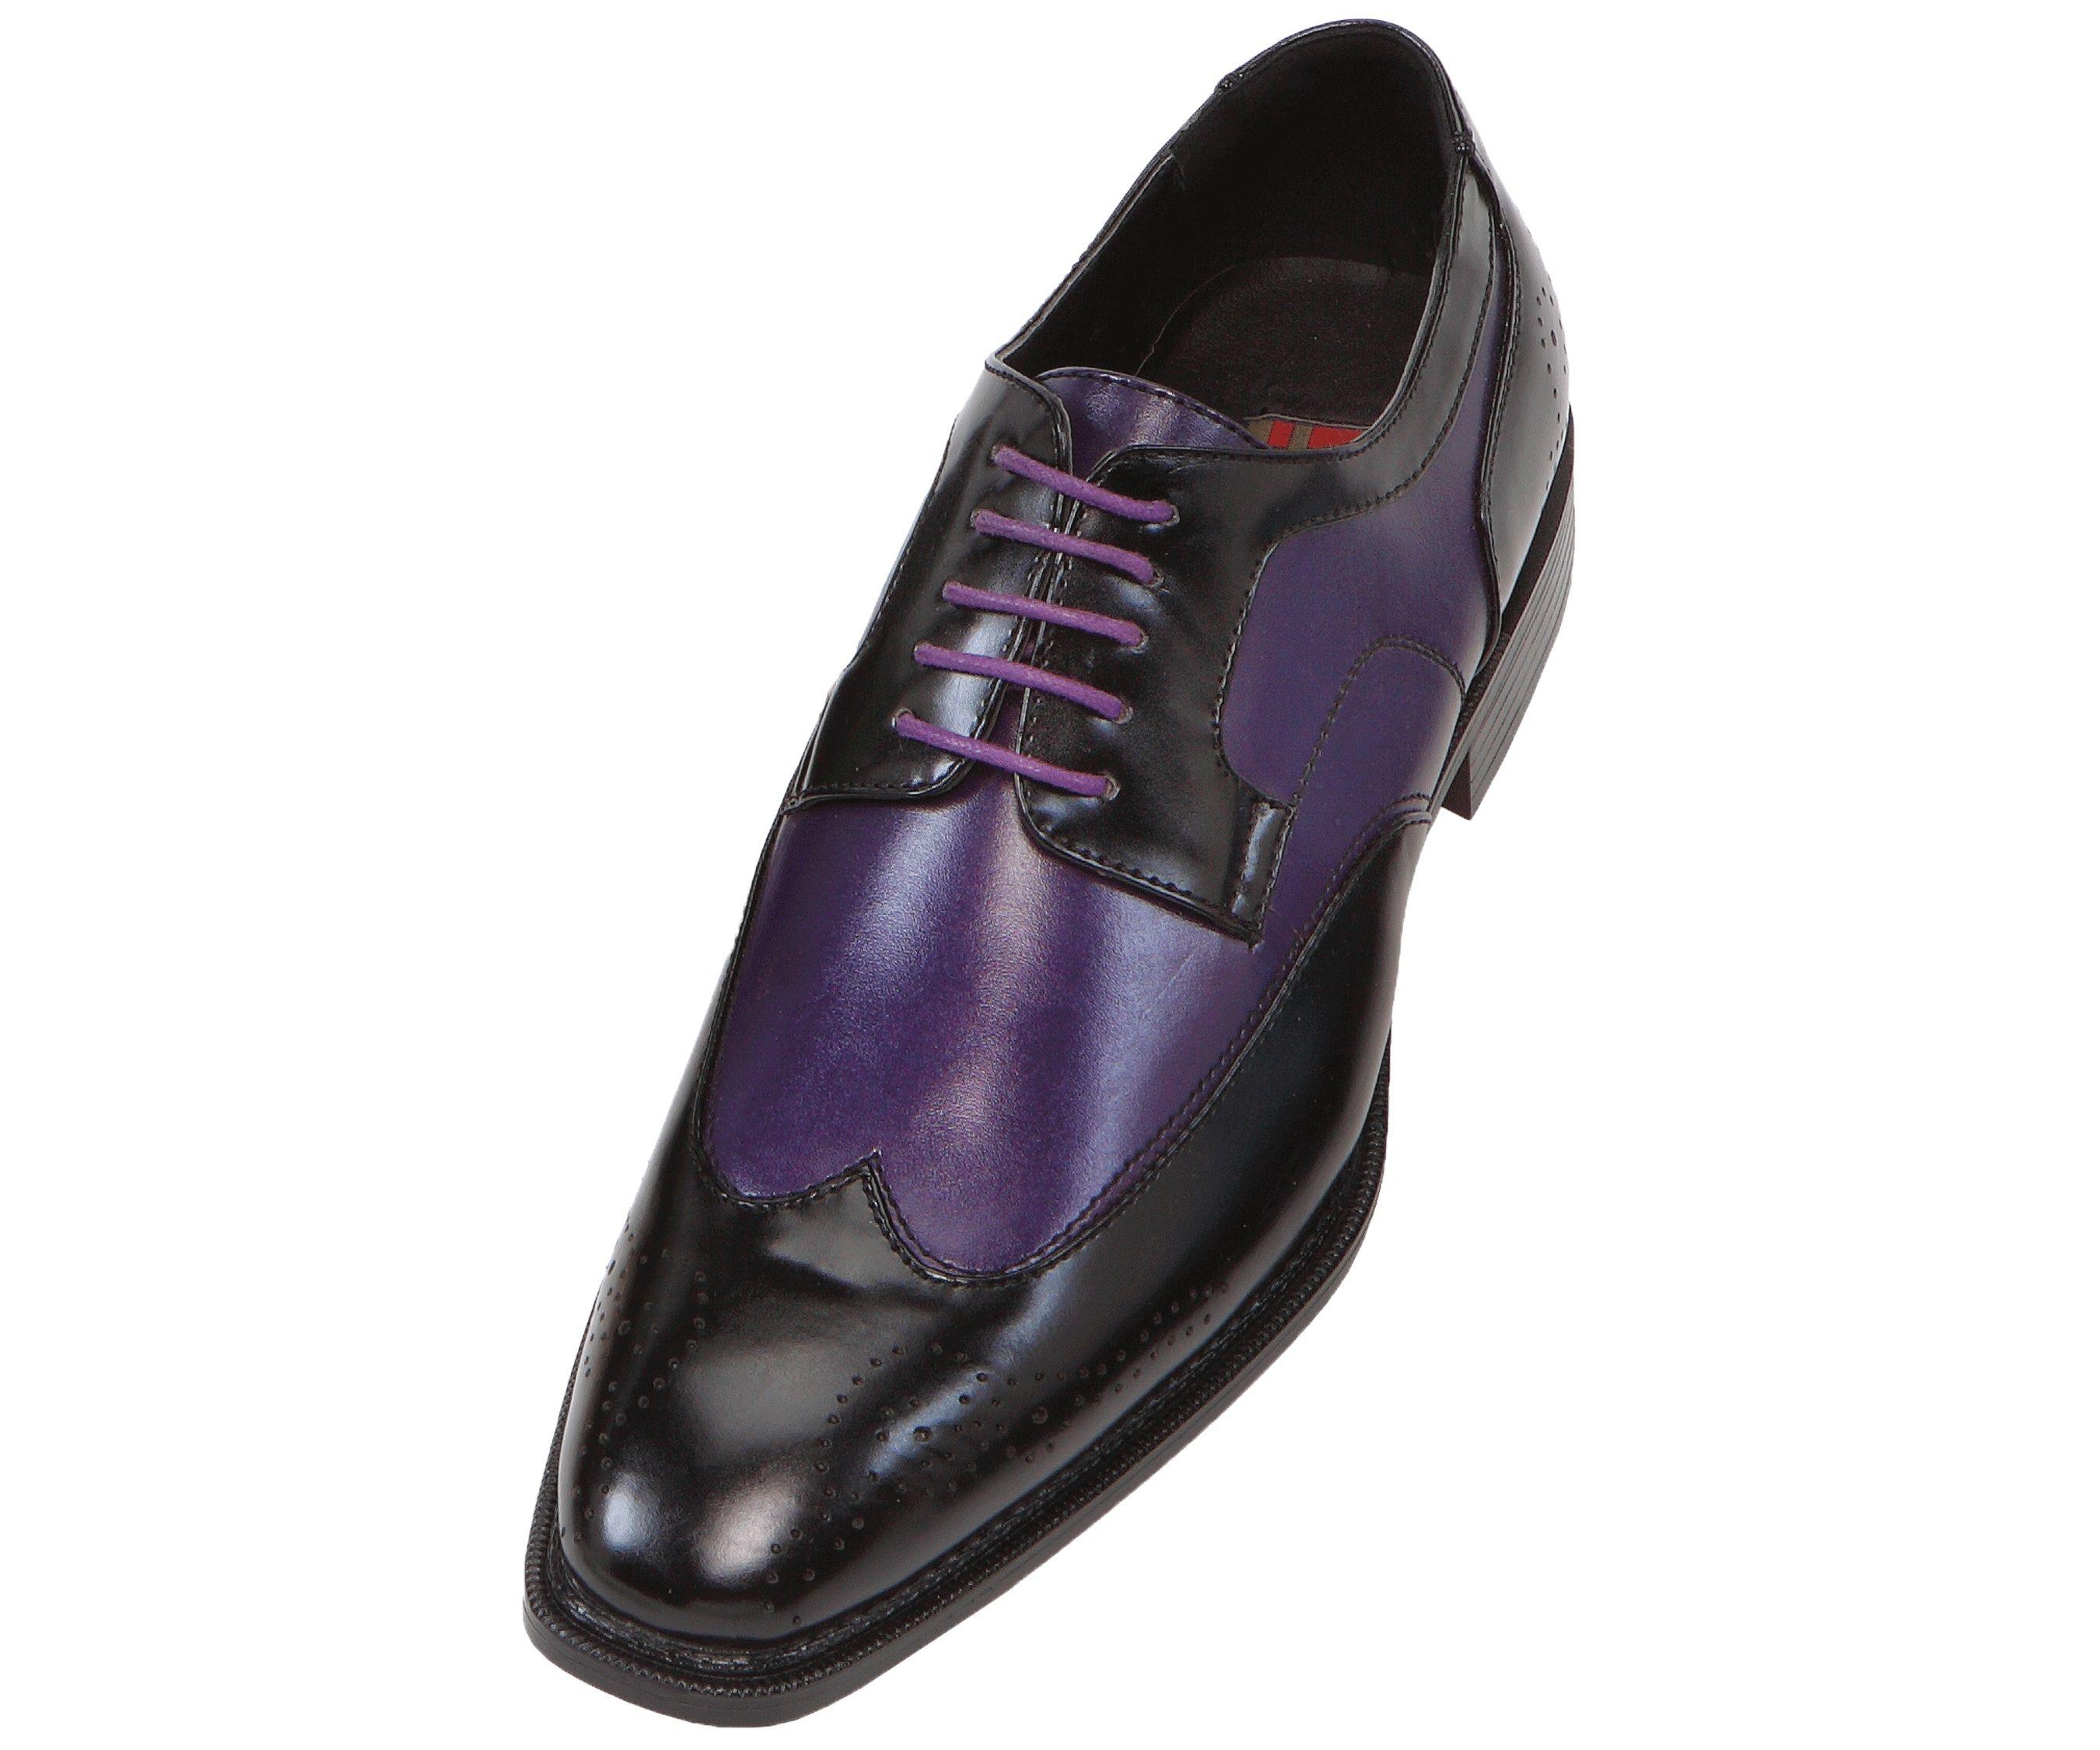 Black dress sandals for wedding - Bolano Mens Black Purple Oxford Two Tone Wingtip Dress Shoe Nia 049